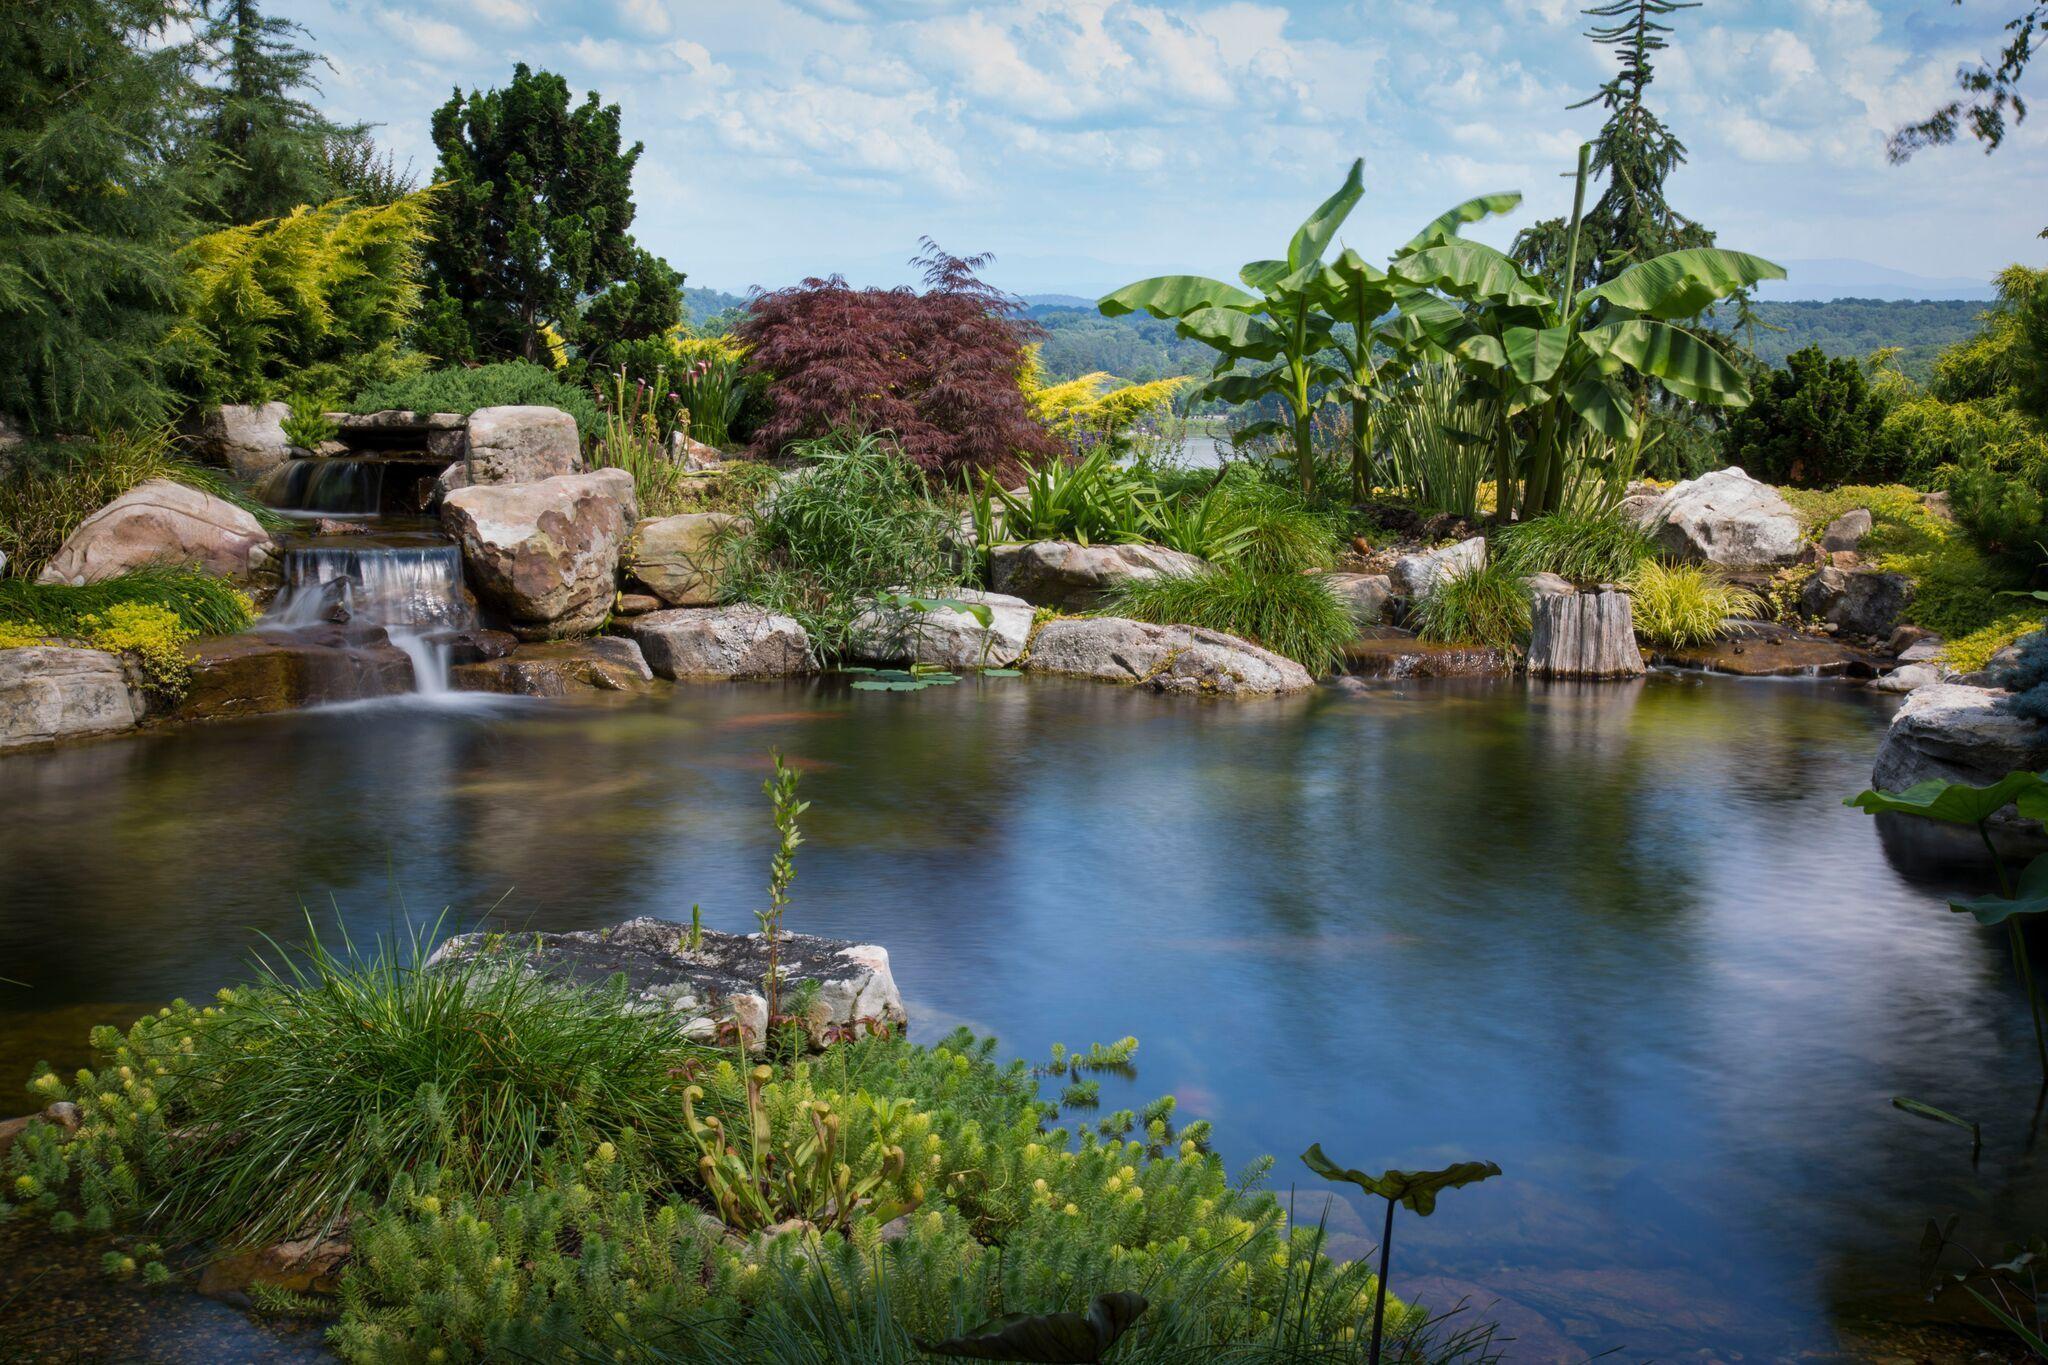 ponds by Joe Matteo | Backyard water feature, Pond water ...